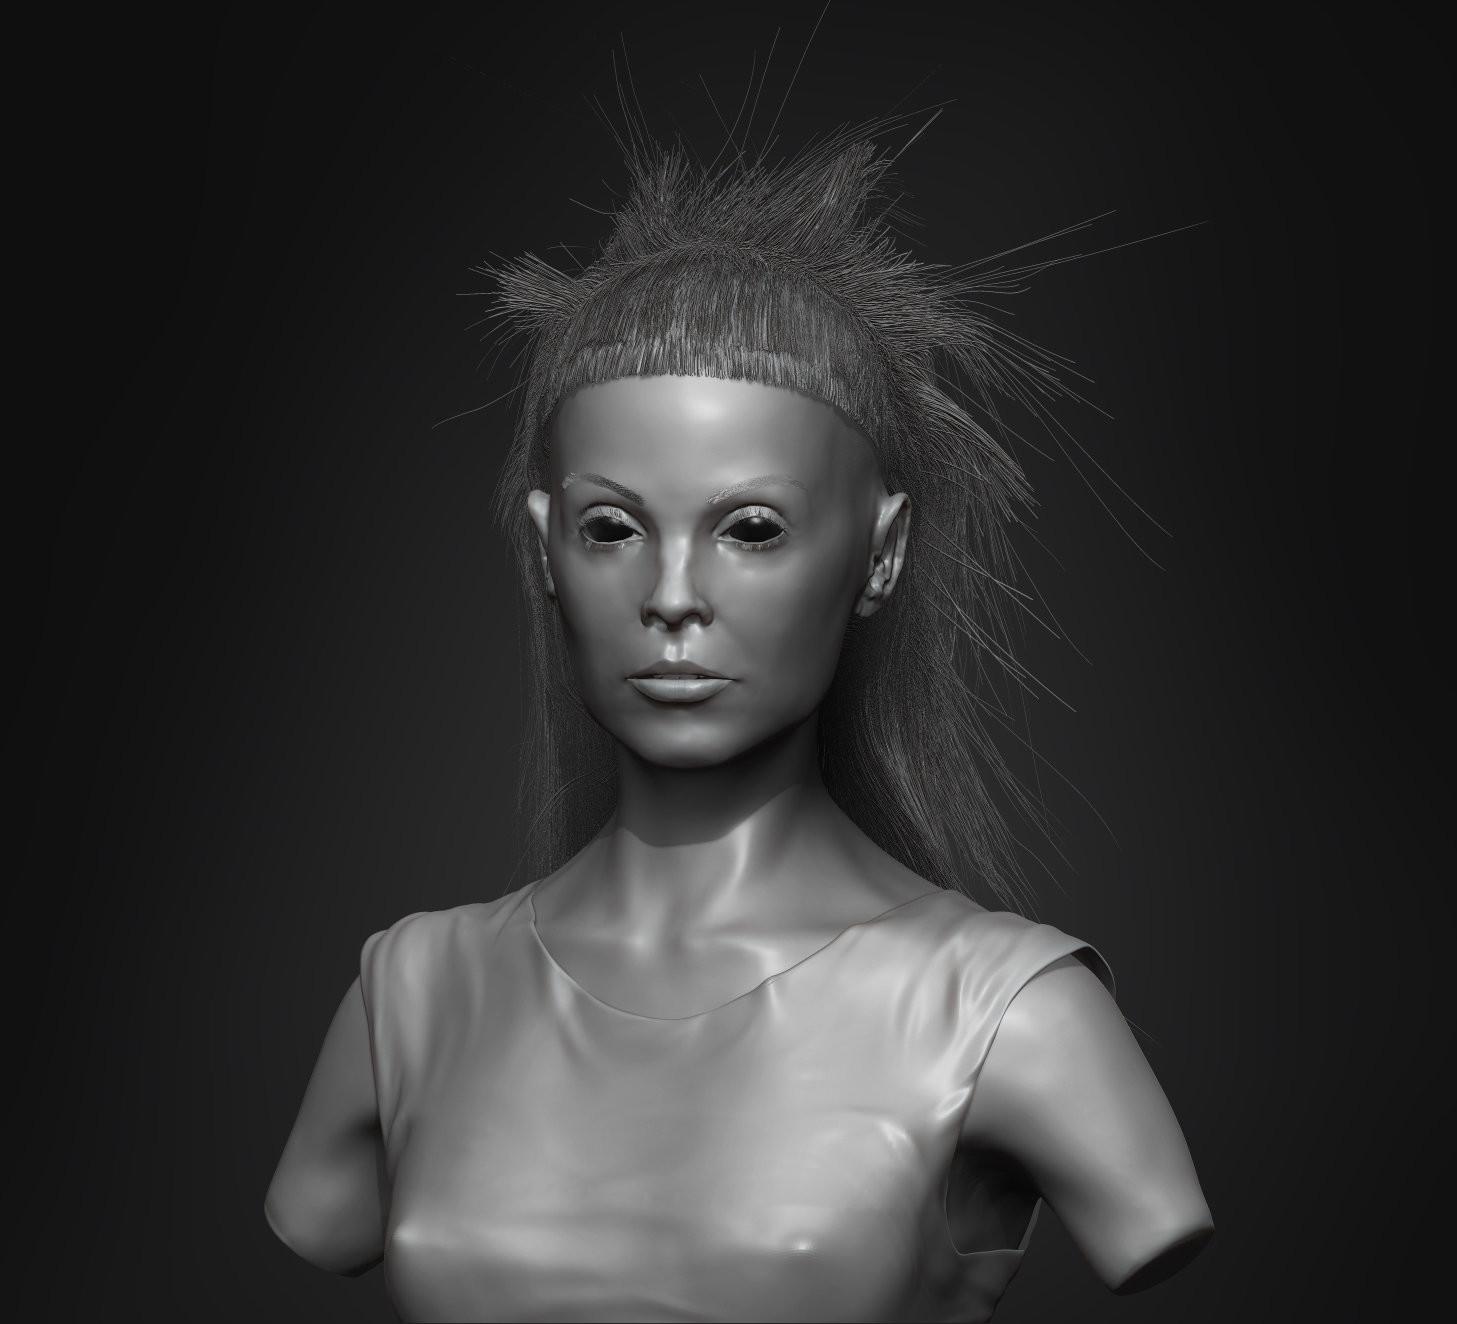 Images Yolandi Visser nude (32 photo), Ass, Sideboobs, Feet, cleavage 2020